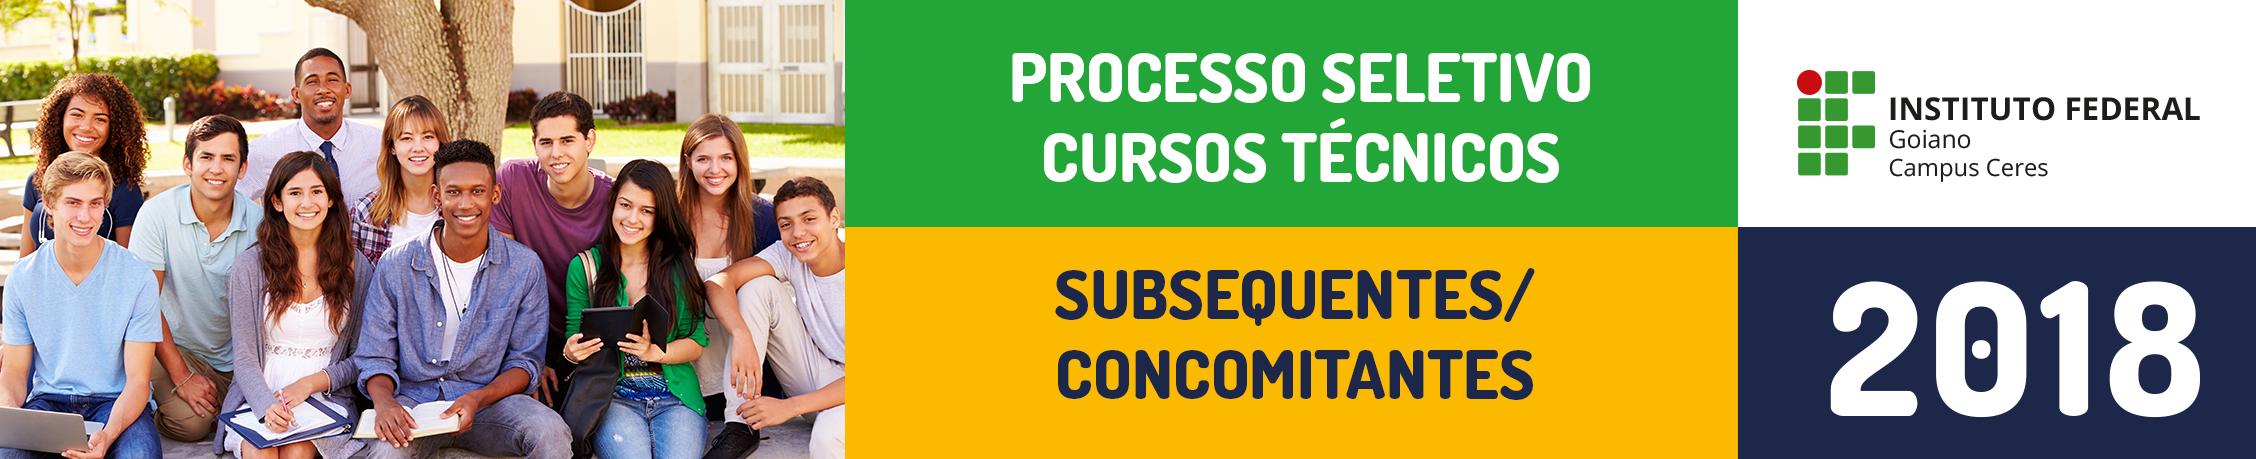 PSCT Subsequente/ concomitante